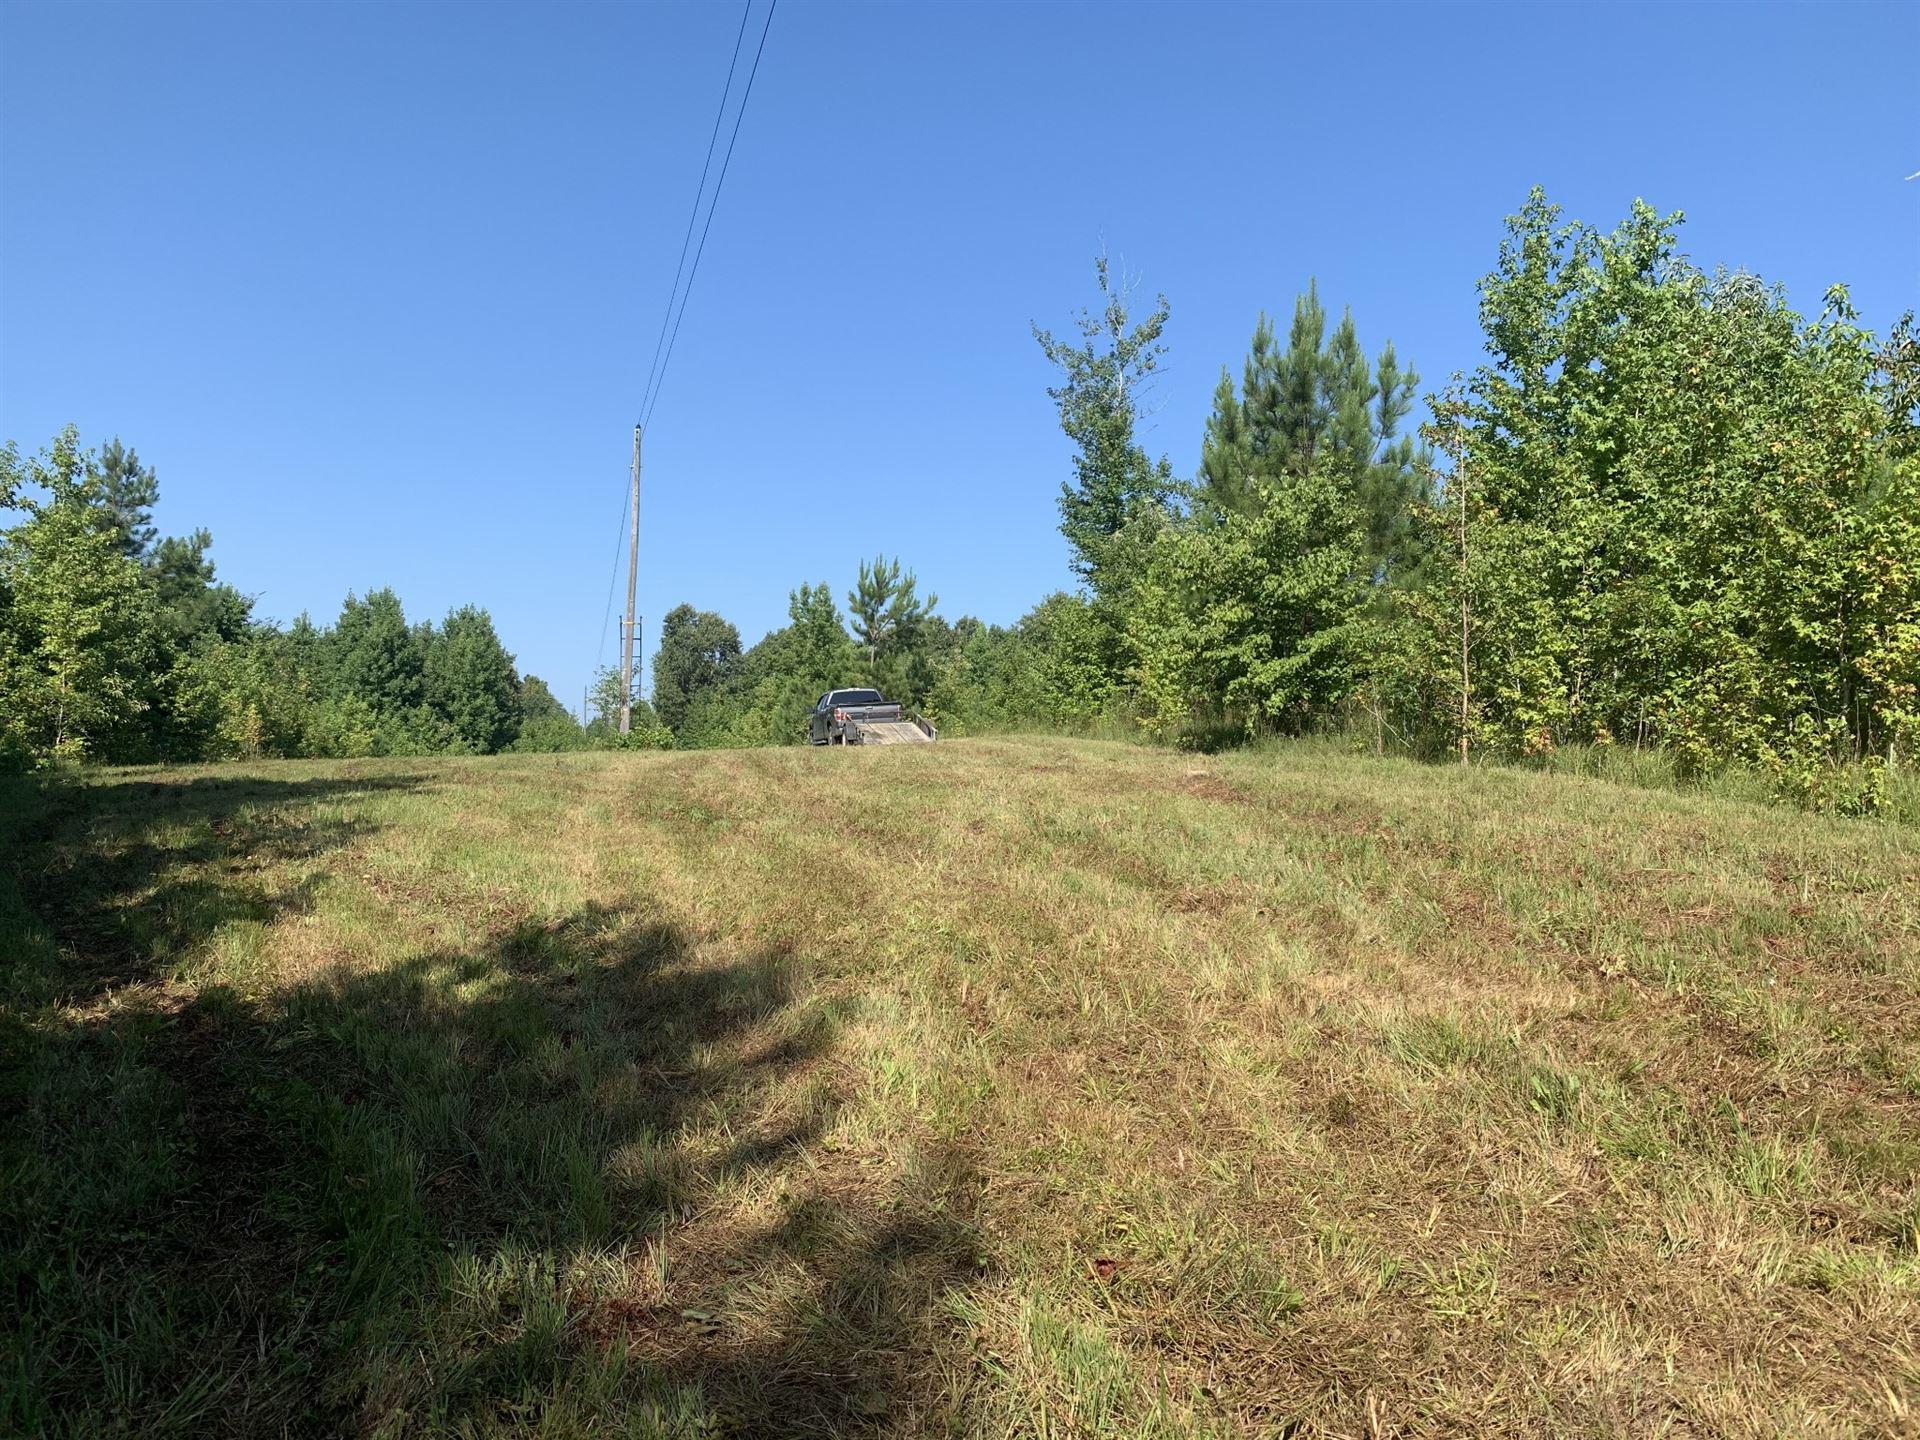 Photo of 0 Little Texas Rd, Leoma, TN 38468 (MLS # 2177217)